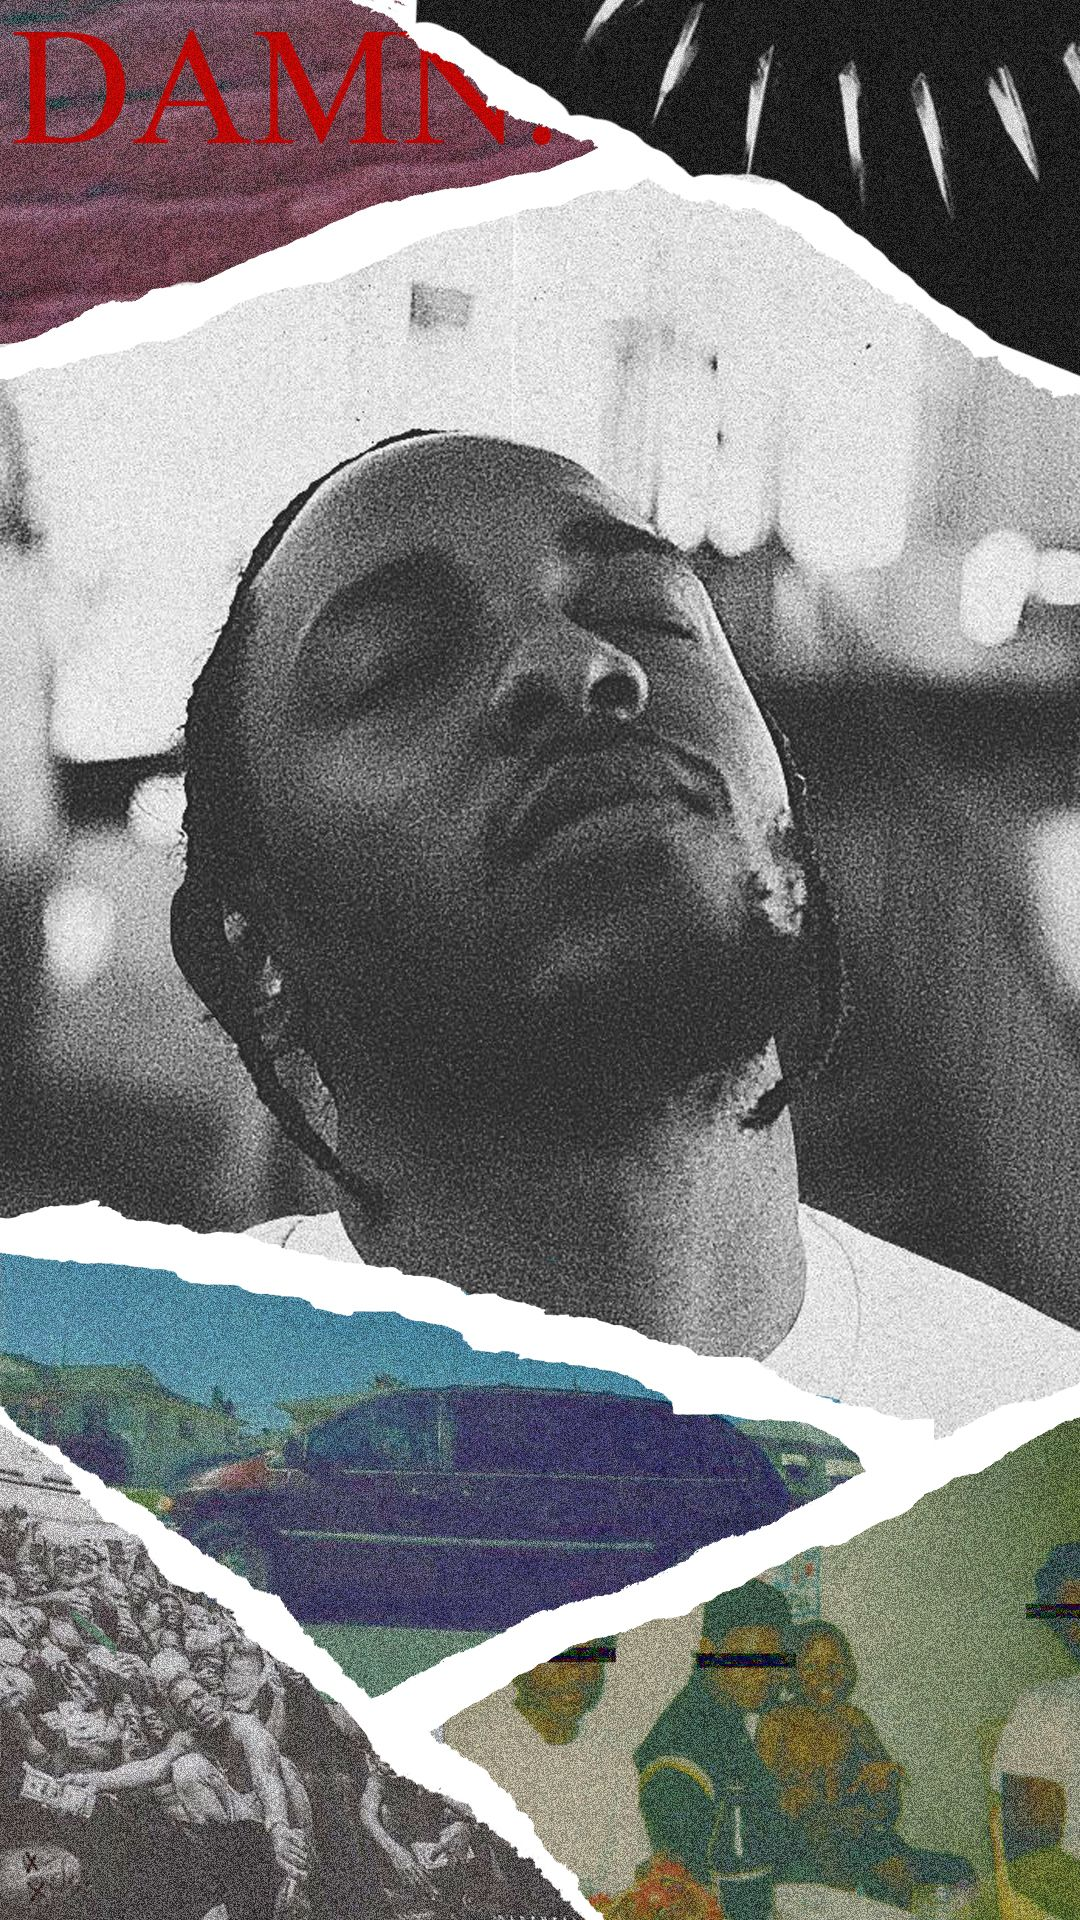 KENDRICK LAMAR WALLPAPER in 2020 Rap wallpaper, Hype